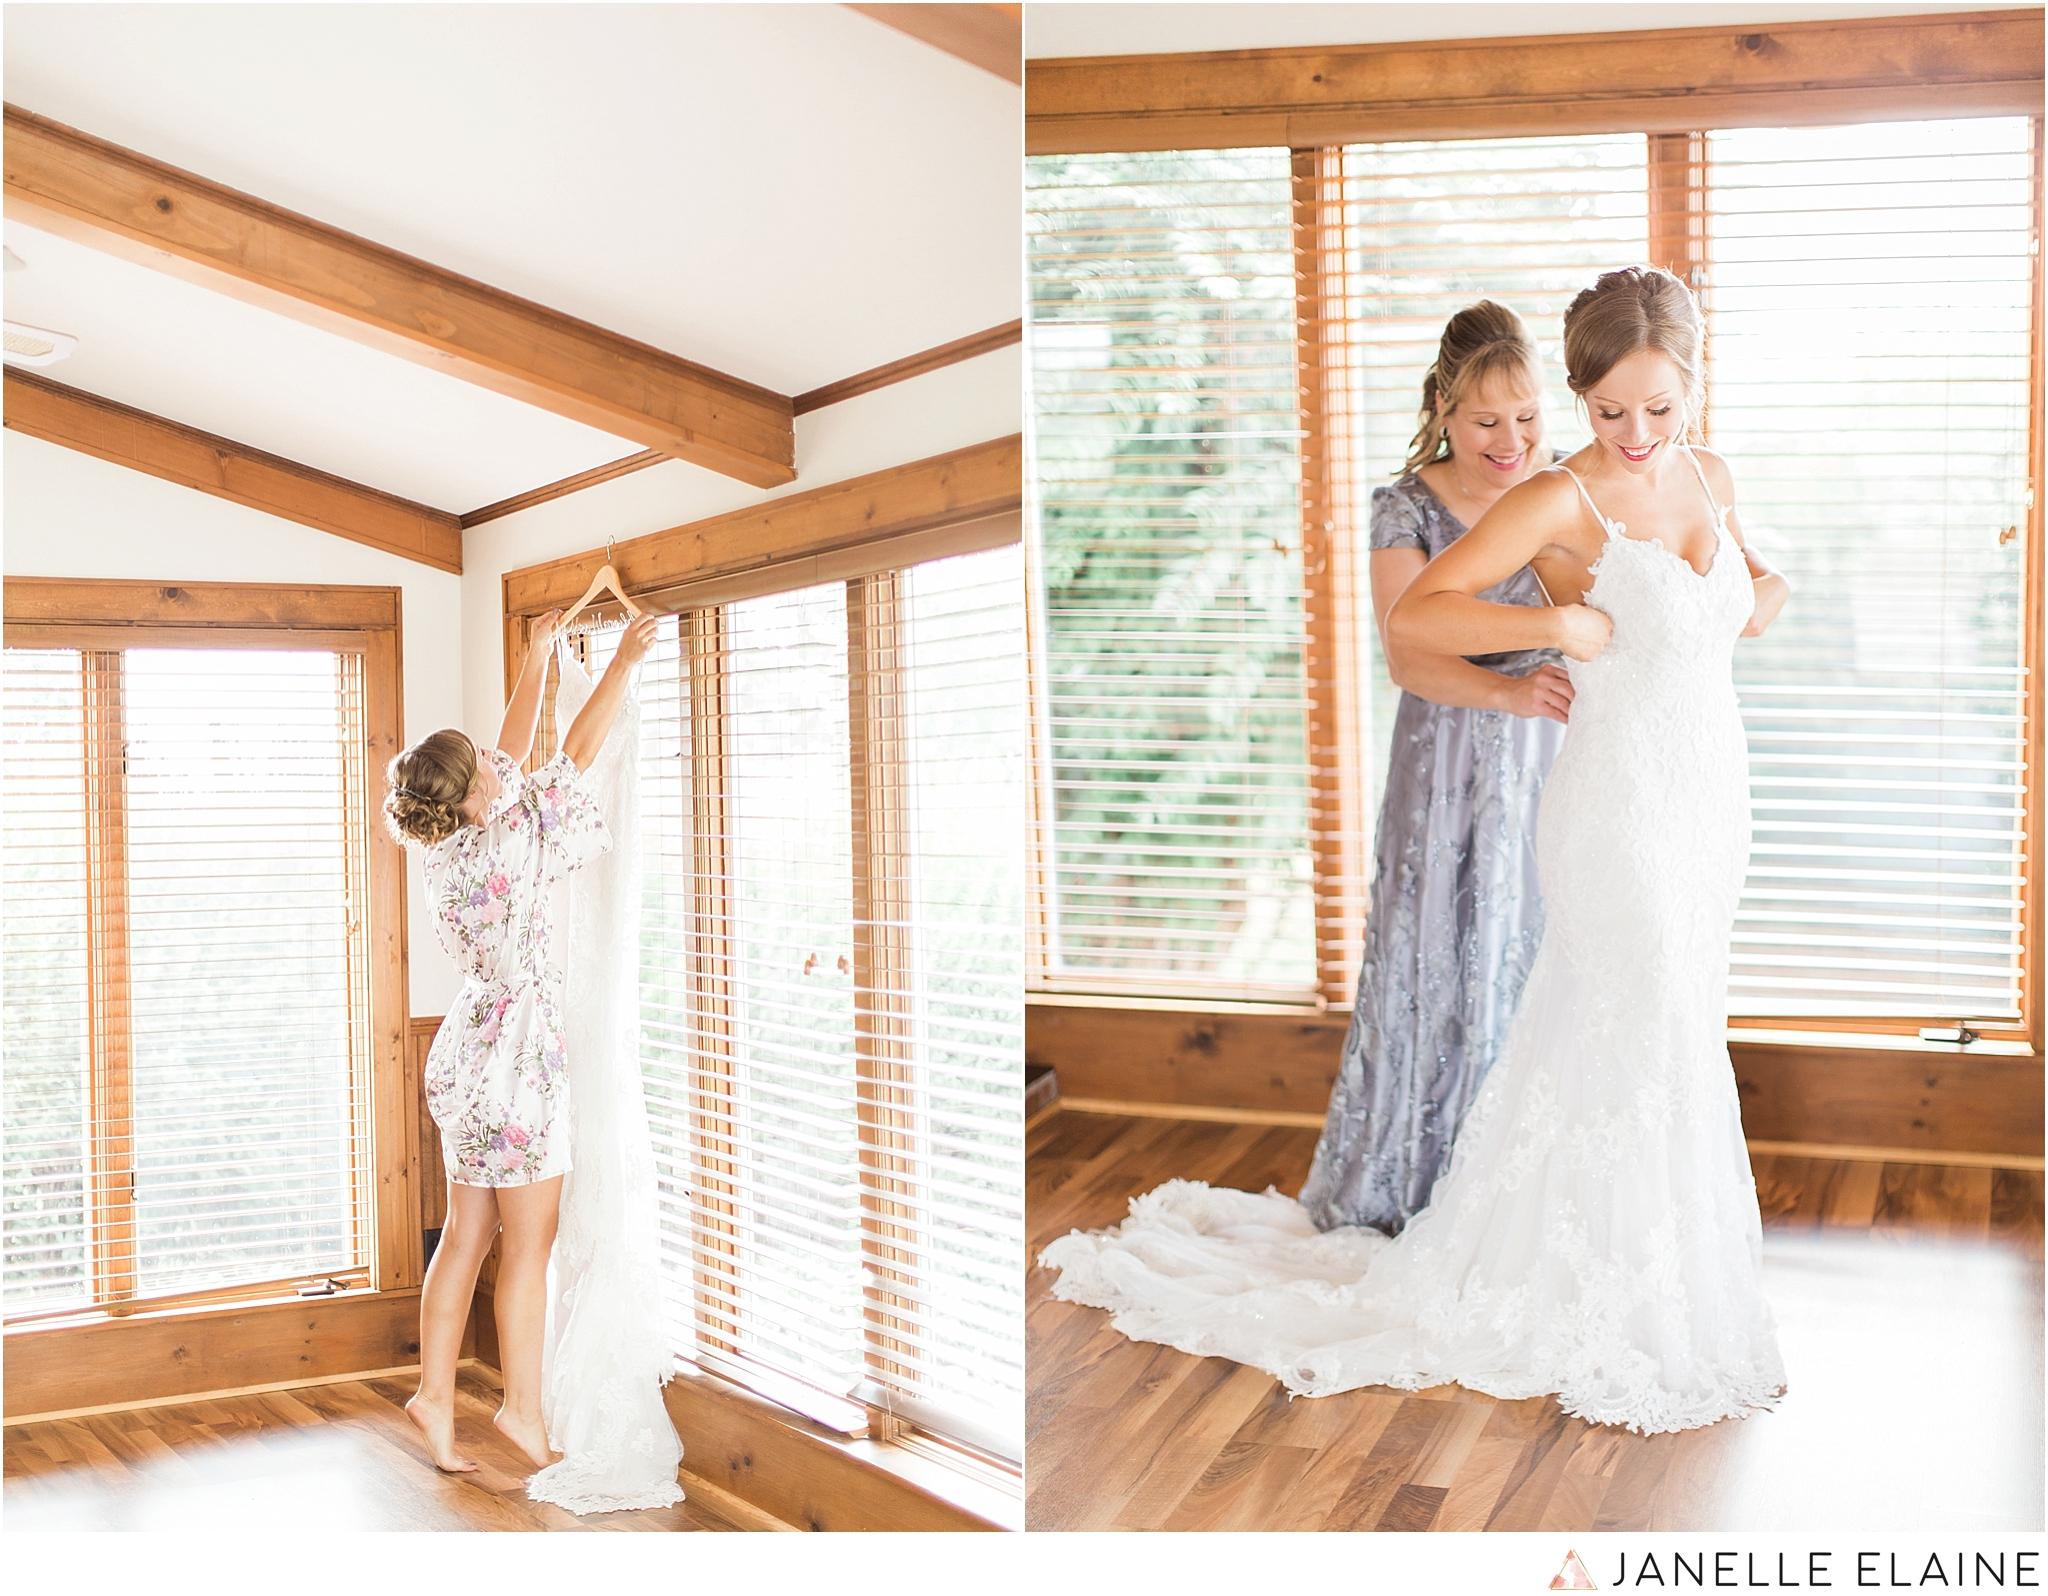 warnsholz-wedding-michigan-photography-janelle elaine photography-22.jpg